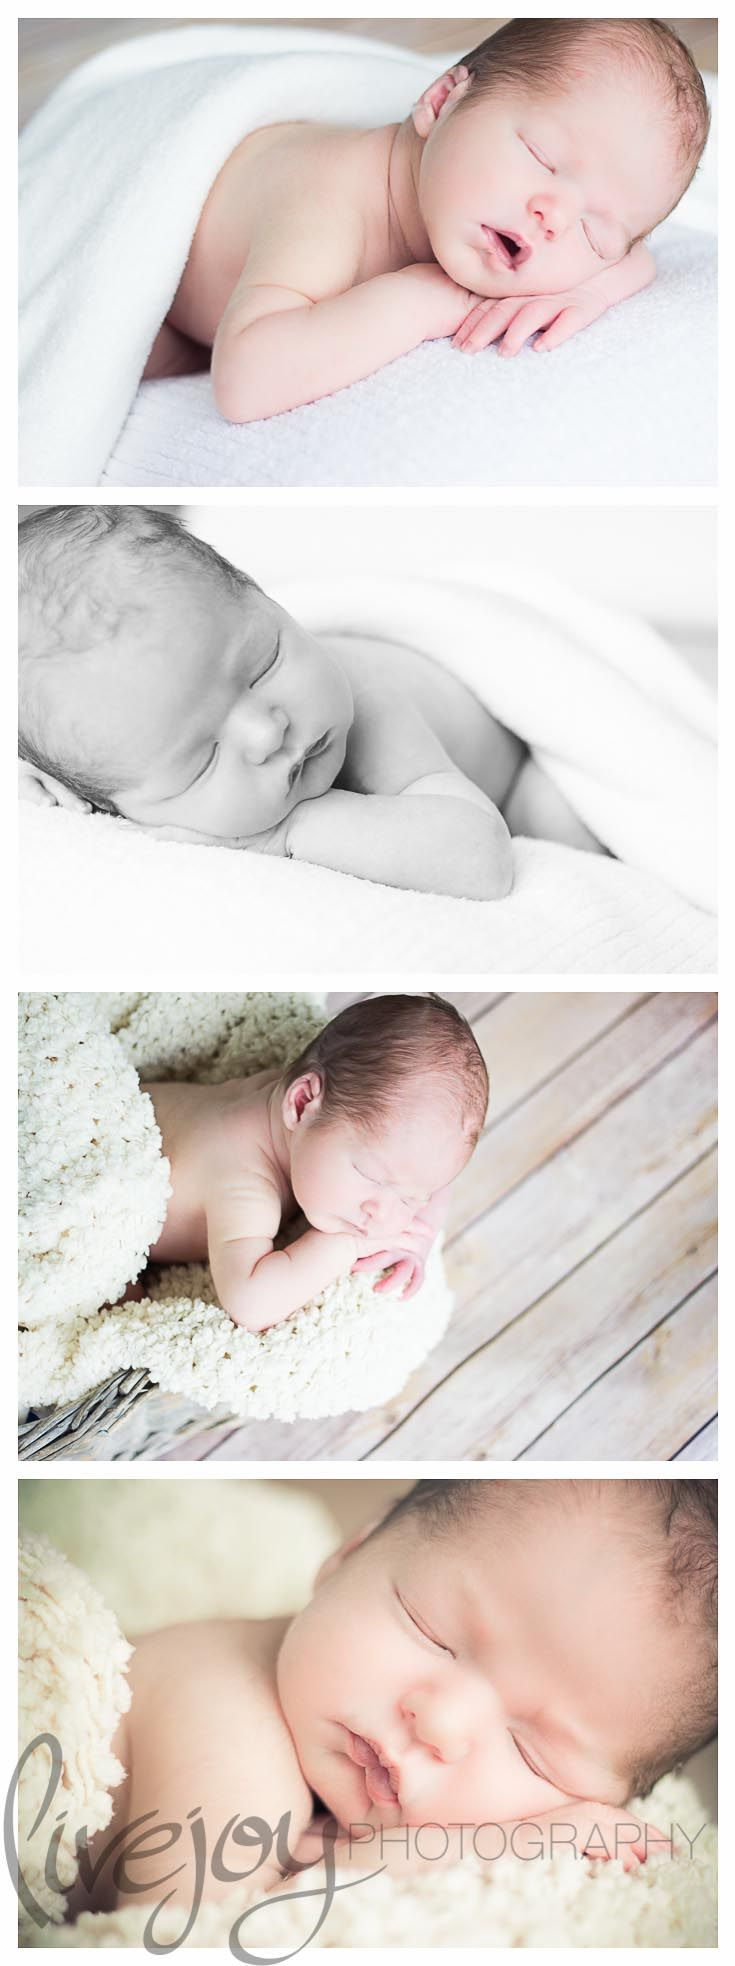 Newborn Photography #LiveJoyPhotography #newborn